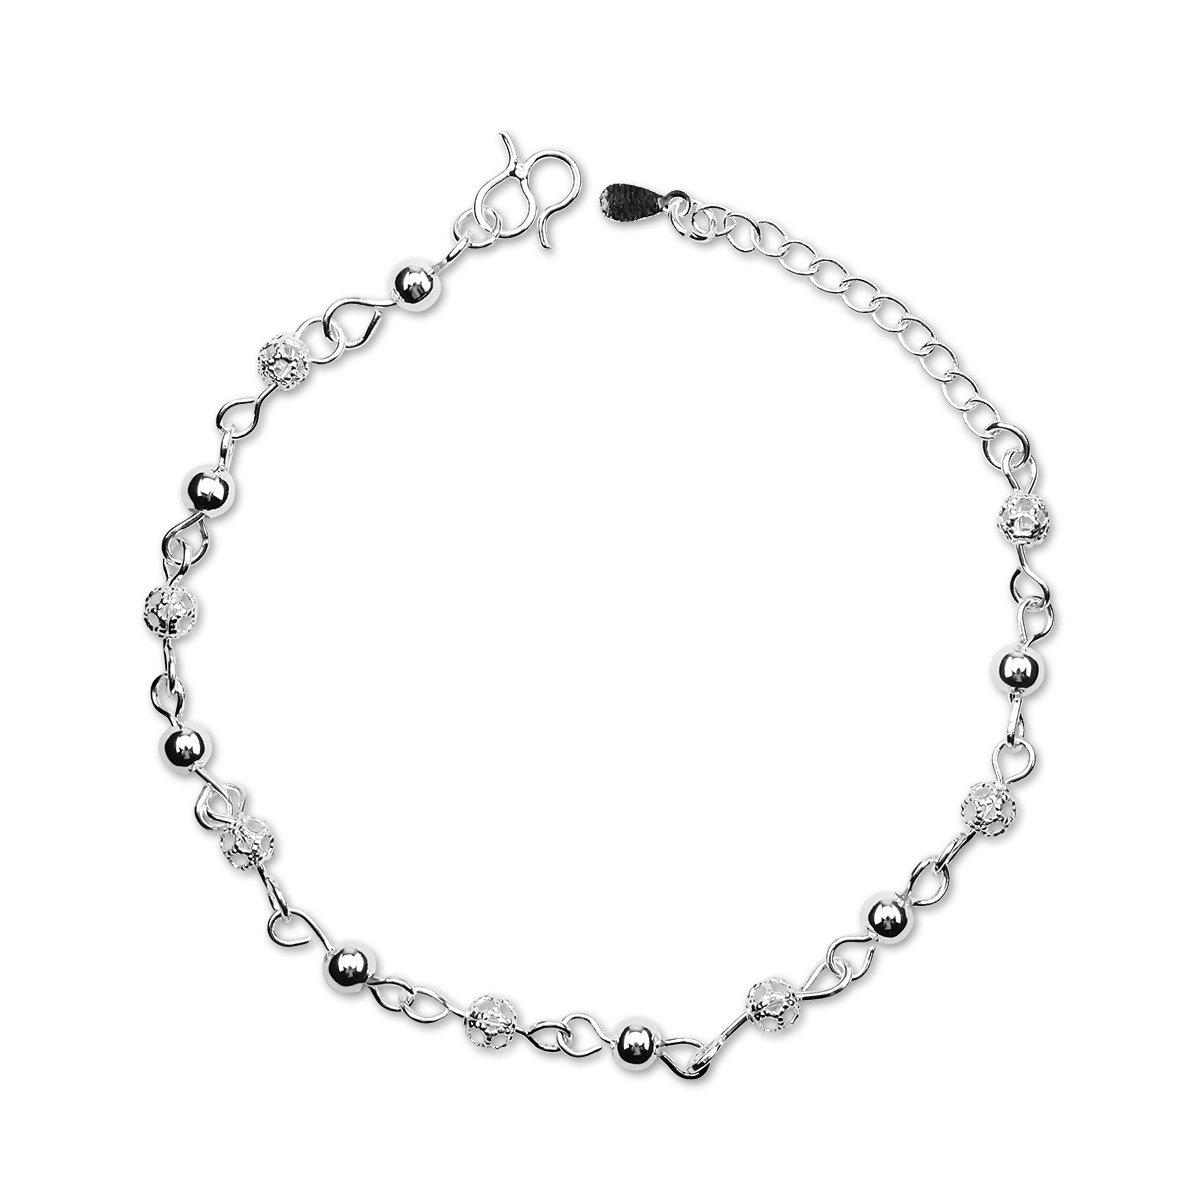 Nanhong Anmutiges Armband mit Mini-Perlen Charm in 925 Sterlingsilber SZ01